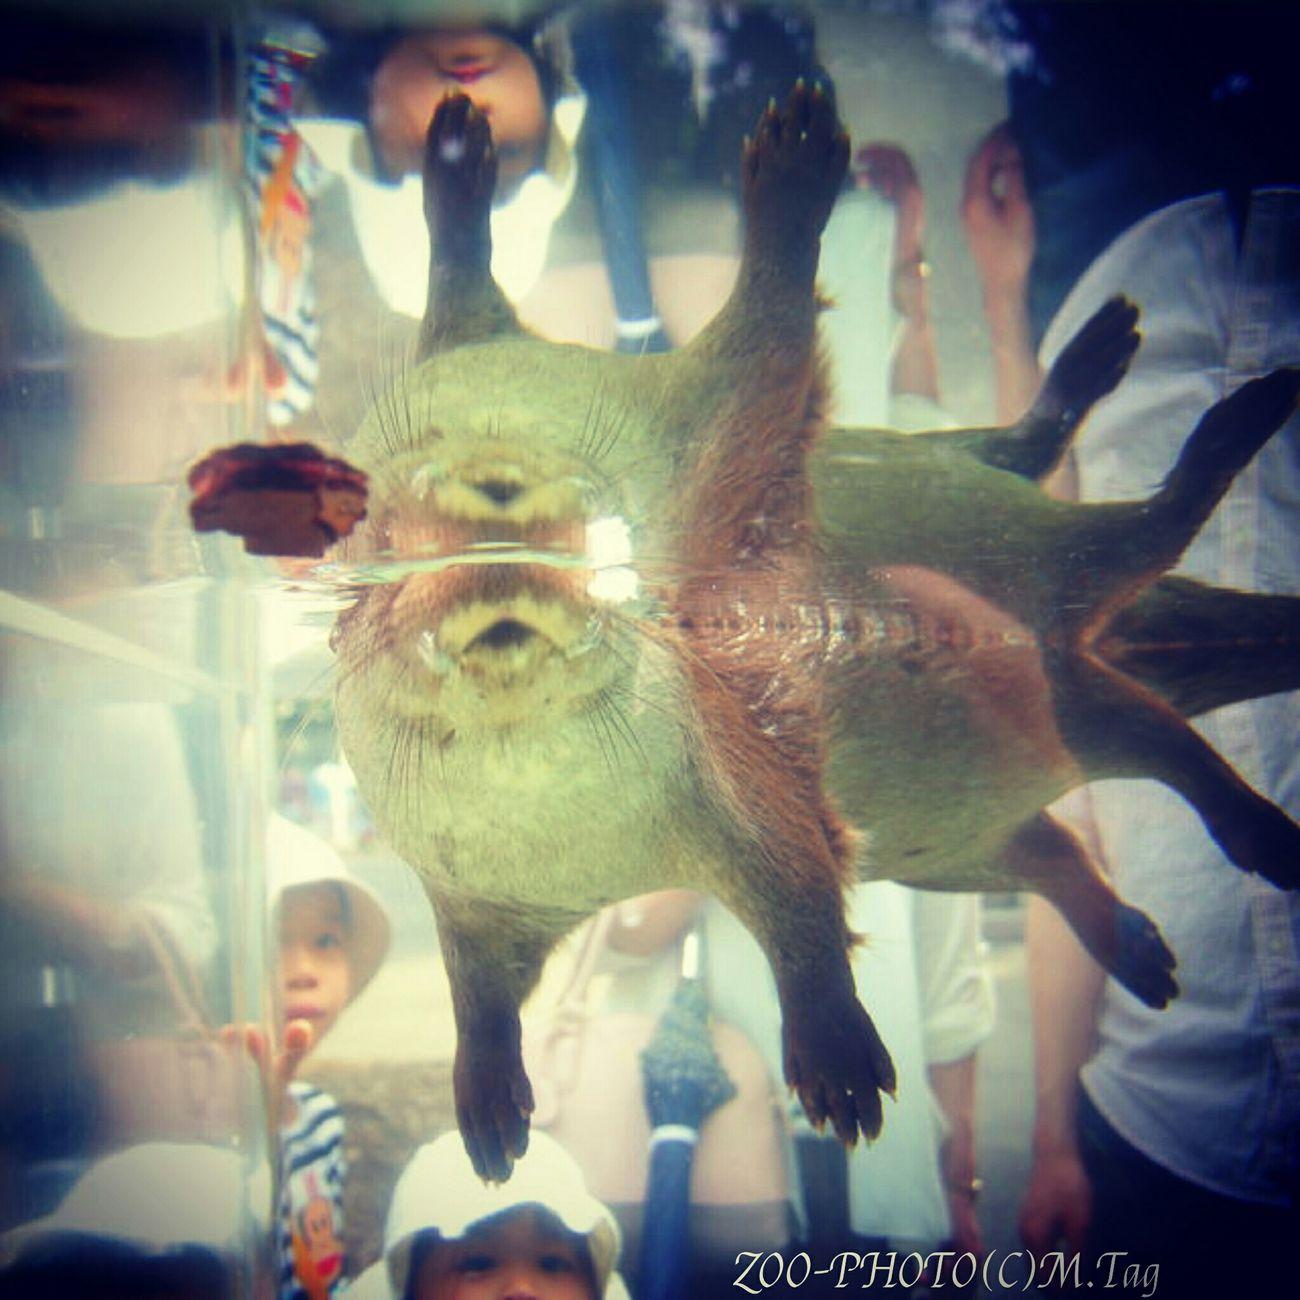 ZOO-PHOTO Zoo Animals 上野動物園 カワウソ 新種発見!